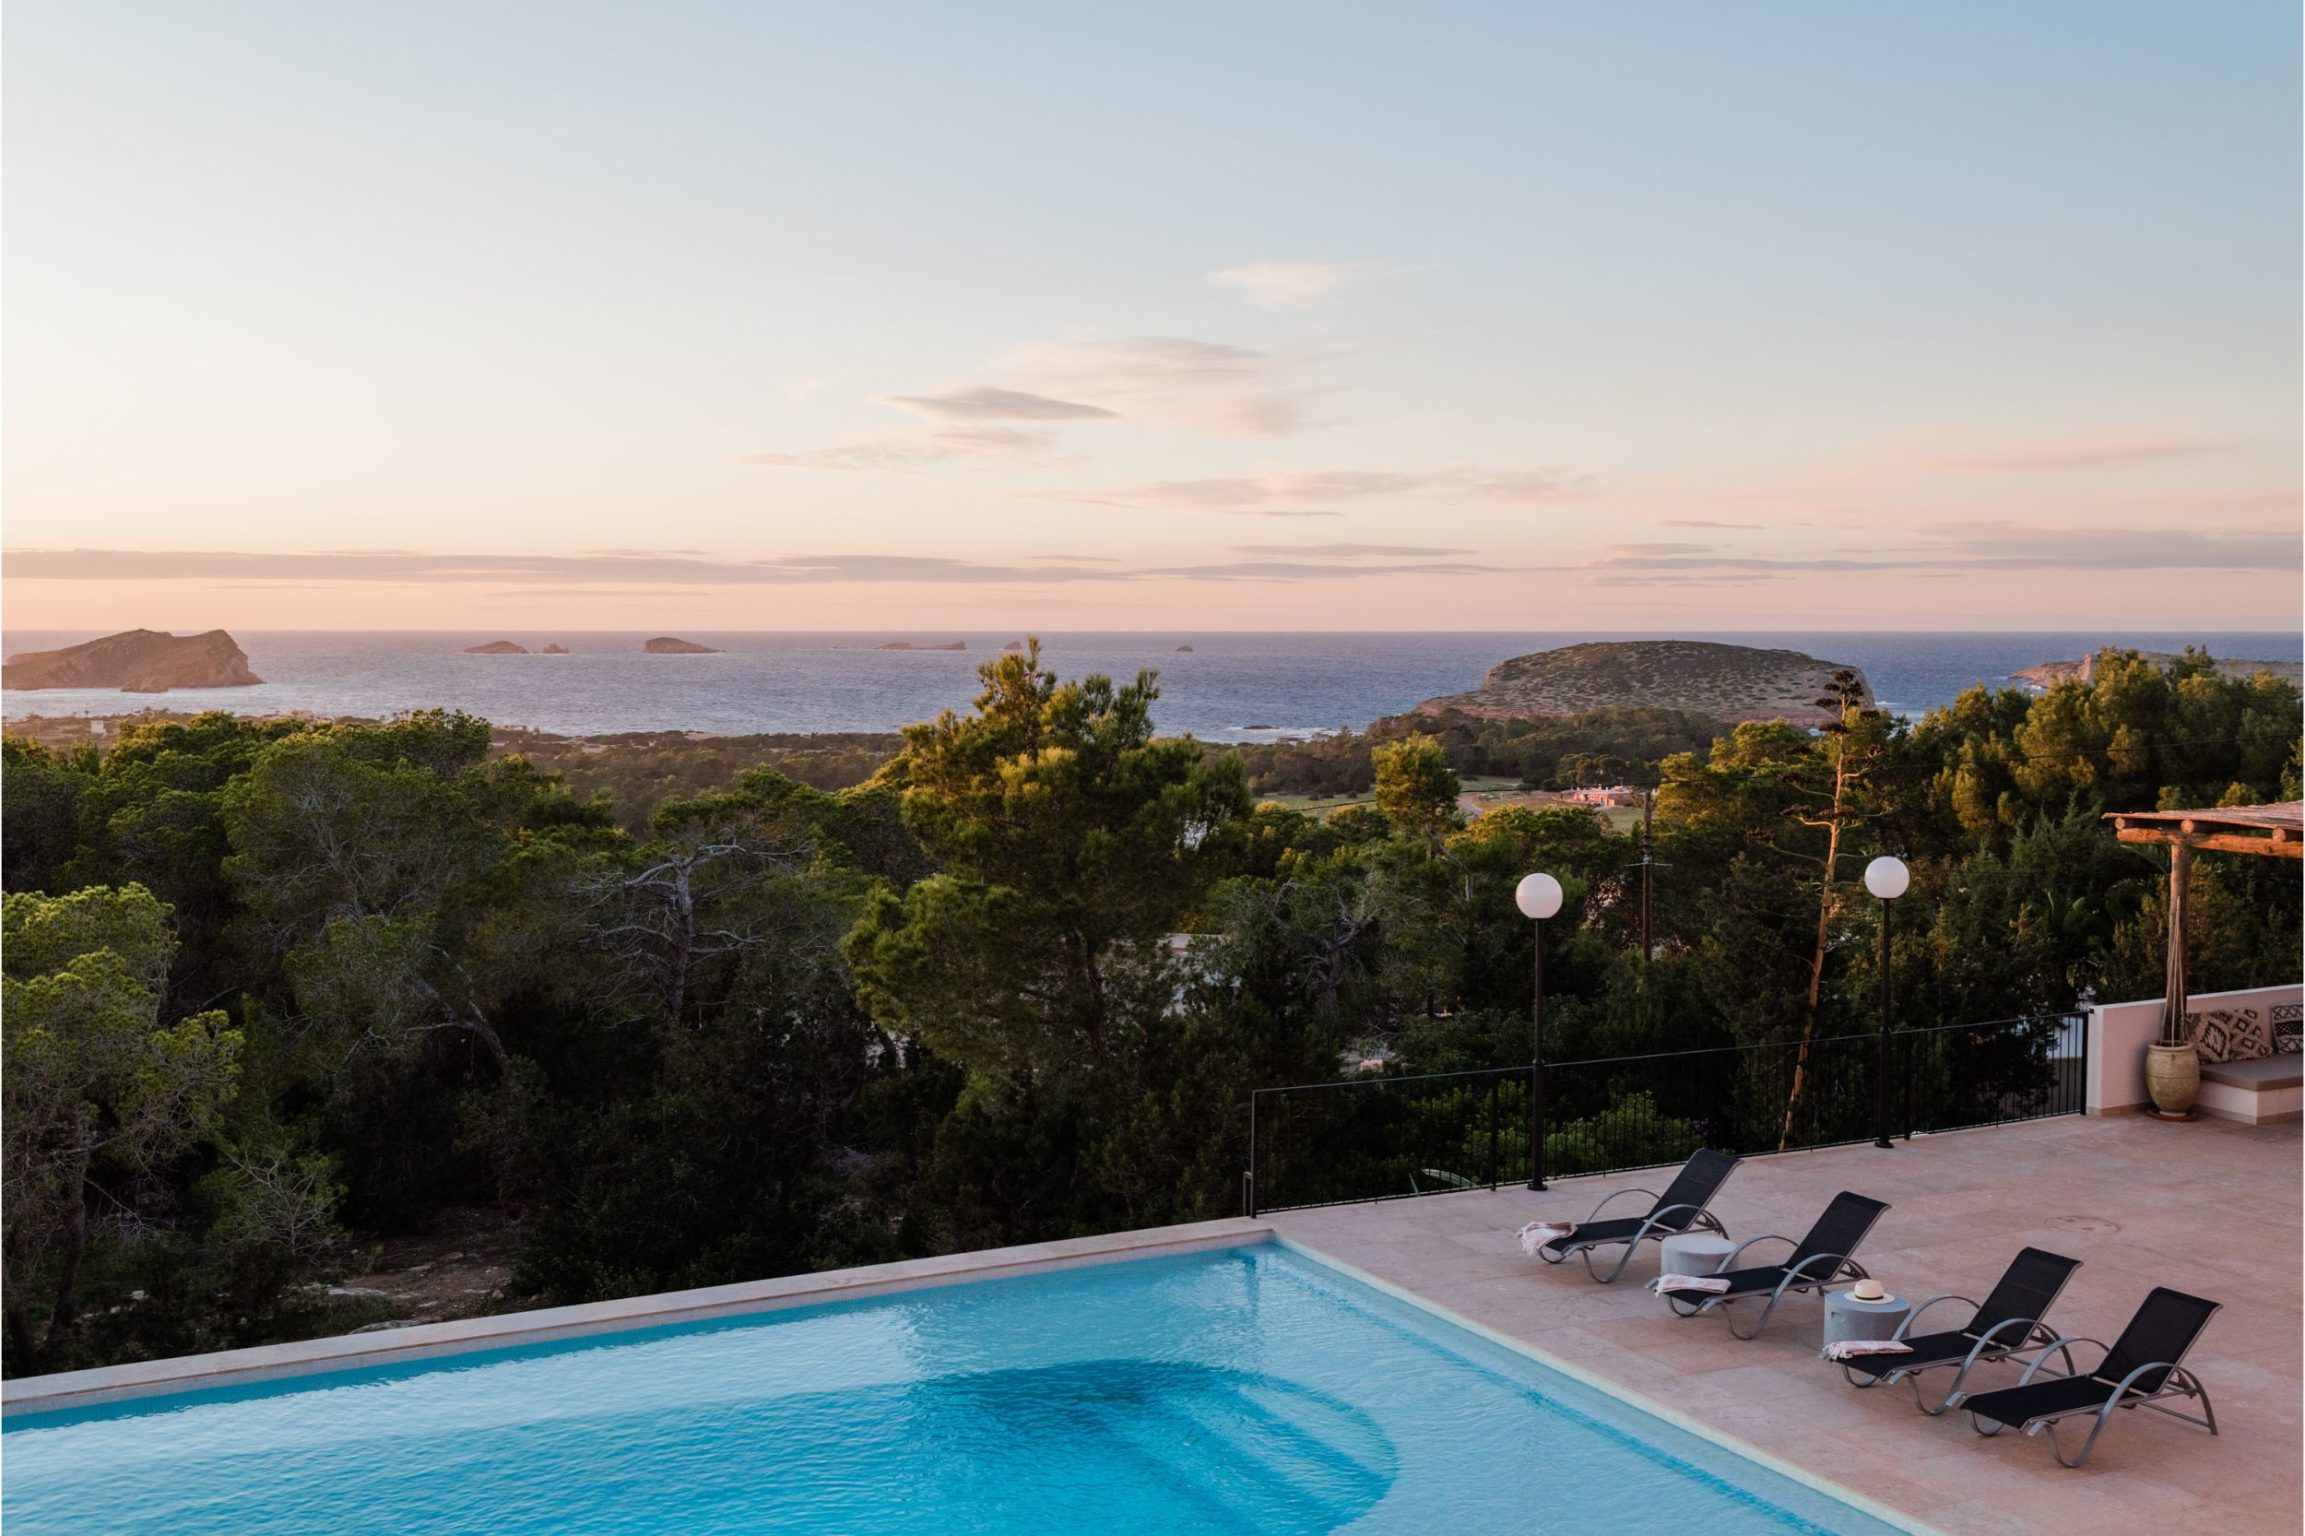 https://www.white-ibiza.com/wp-content/uploads/2020/02/Copy-of-white-ibiza-villas-sa-serra-outdoors-2305x1536.jpg